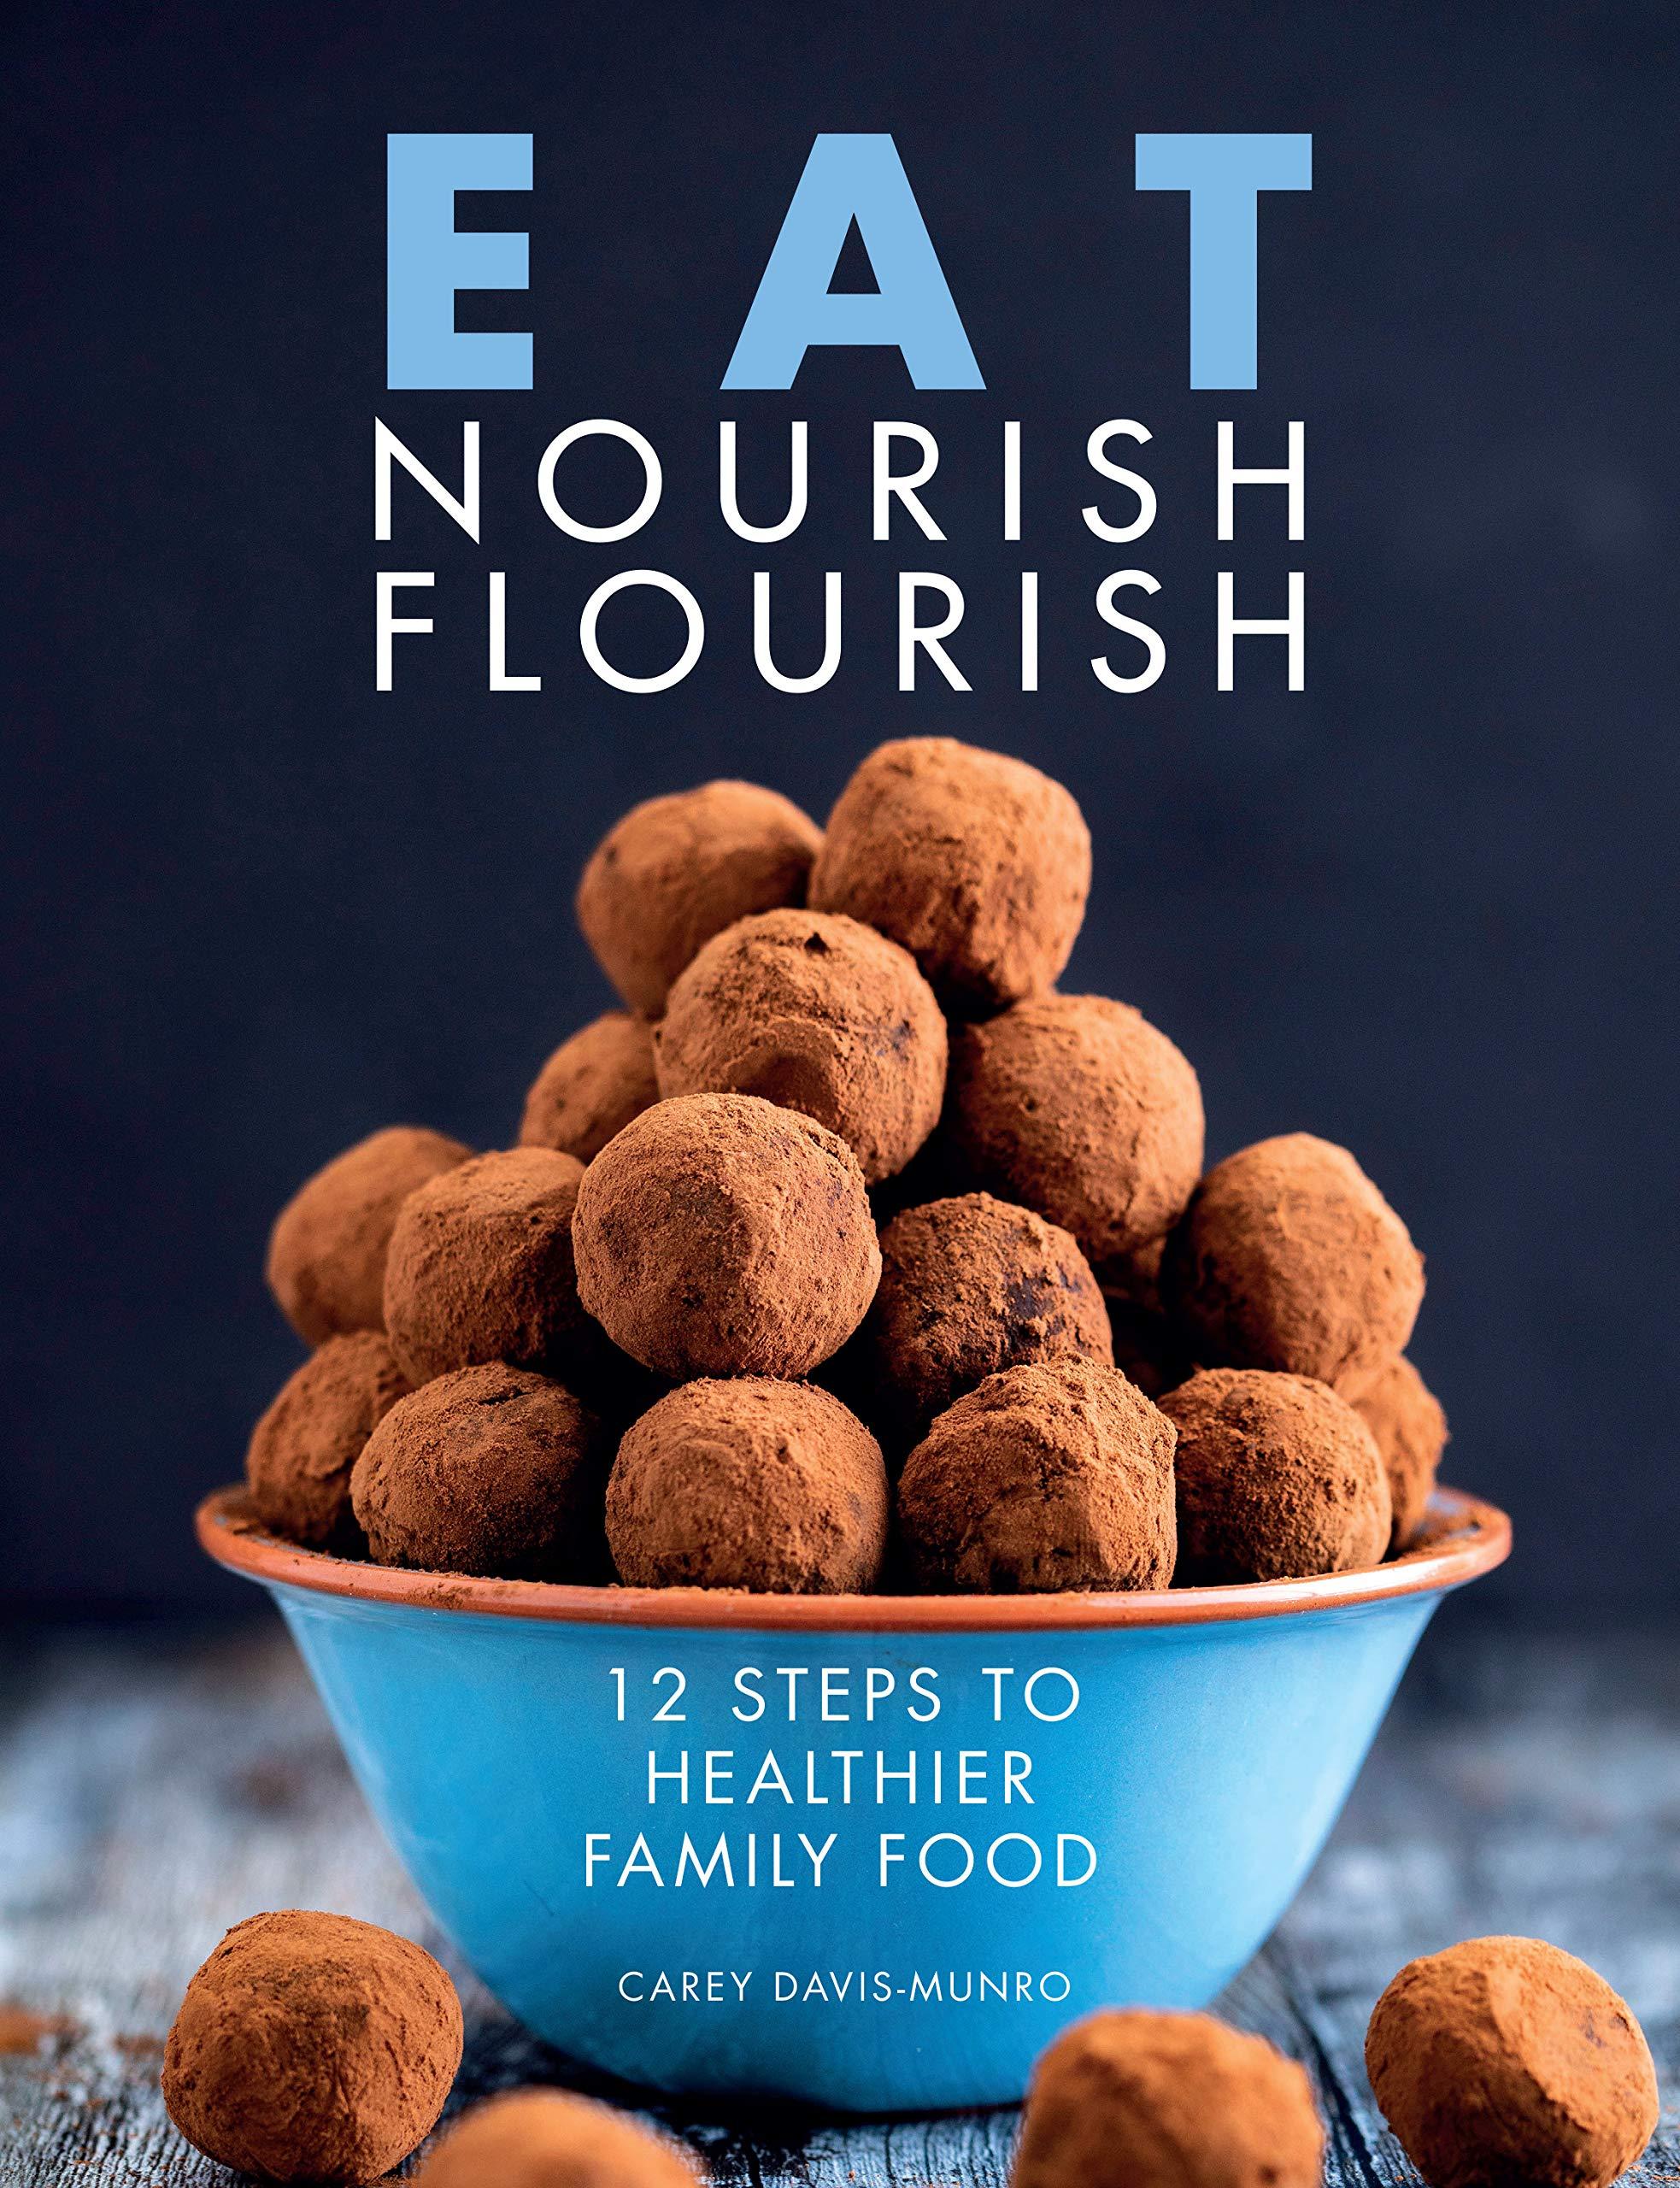 Eat Nourish Flourish: 12 Steps to Healthier Family Food ...